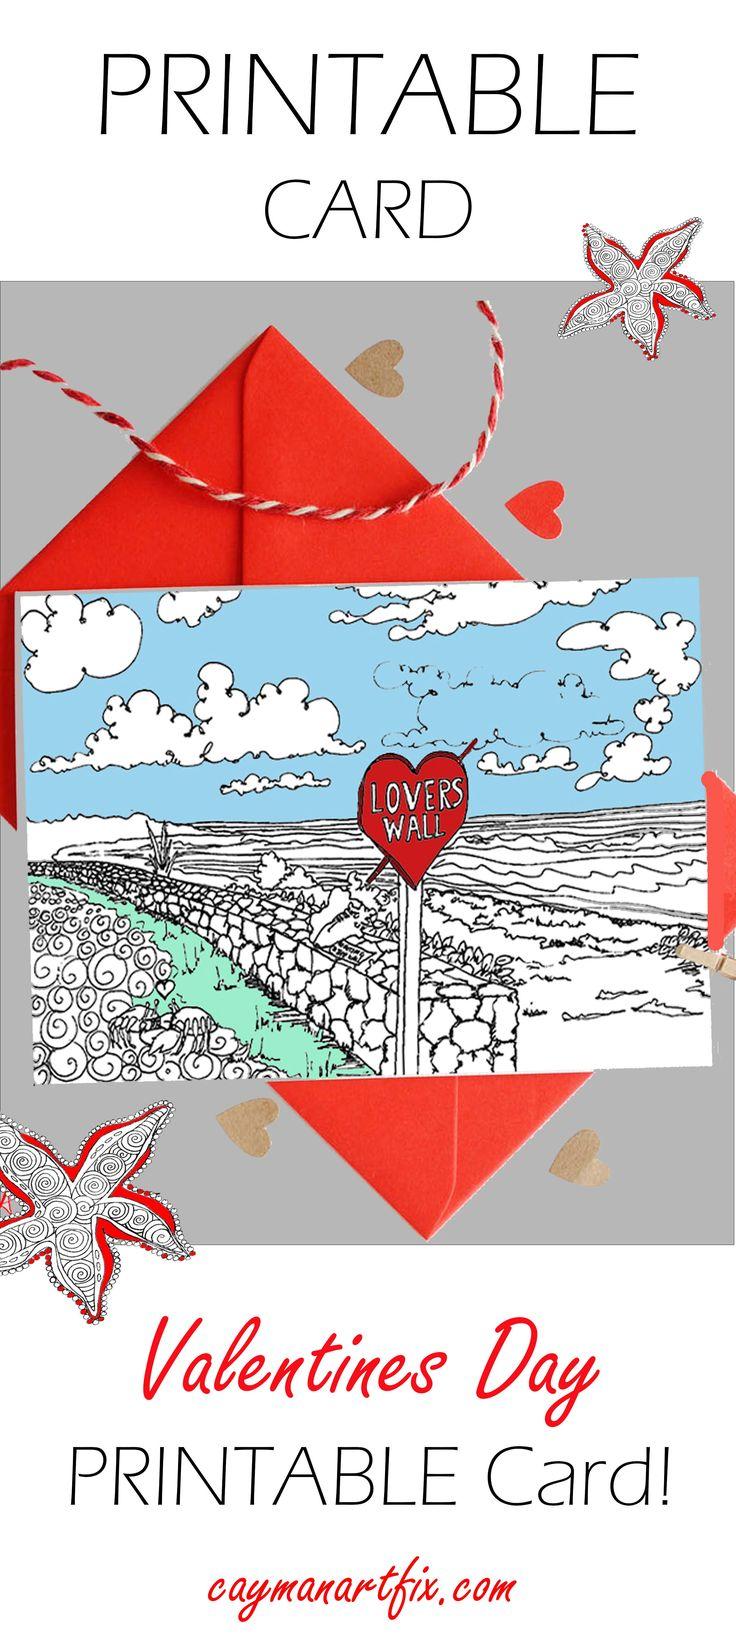 #valentinesday #printable #card #color #keepsake #Loverswall #eastend #Caymanislands #caymanartist #Celebrate #personalised #gift #2018 #caymanislands #caymanartfix